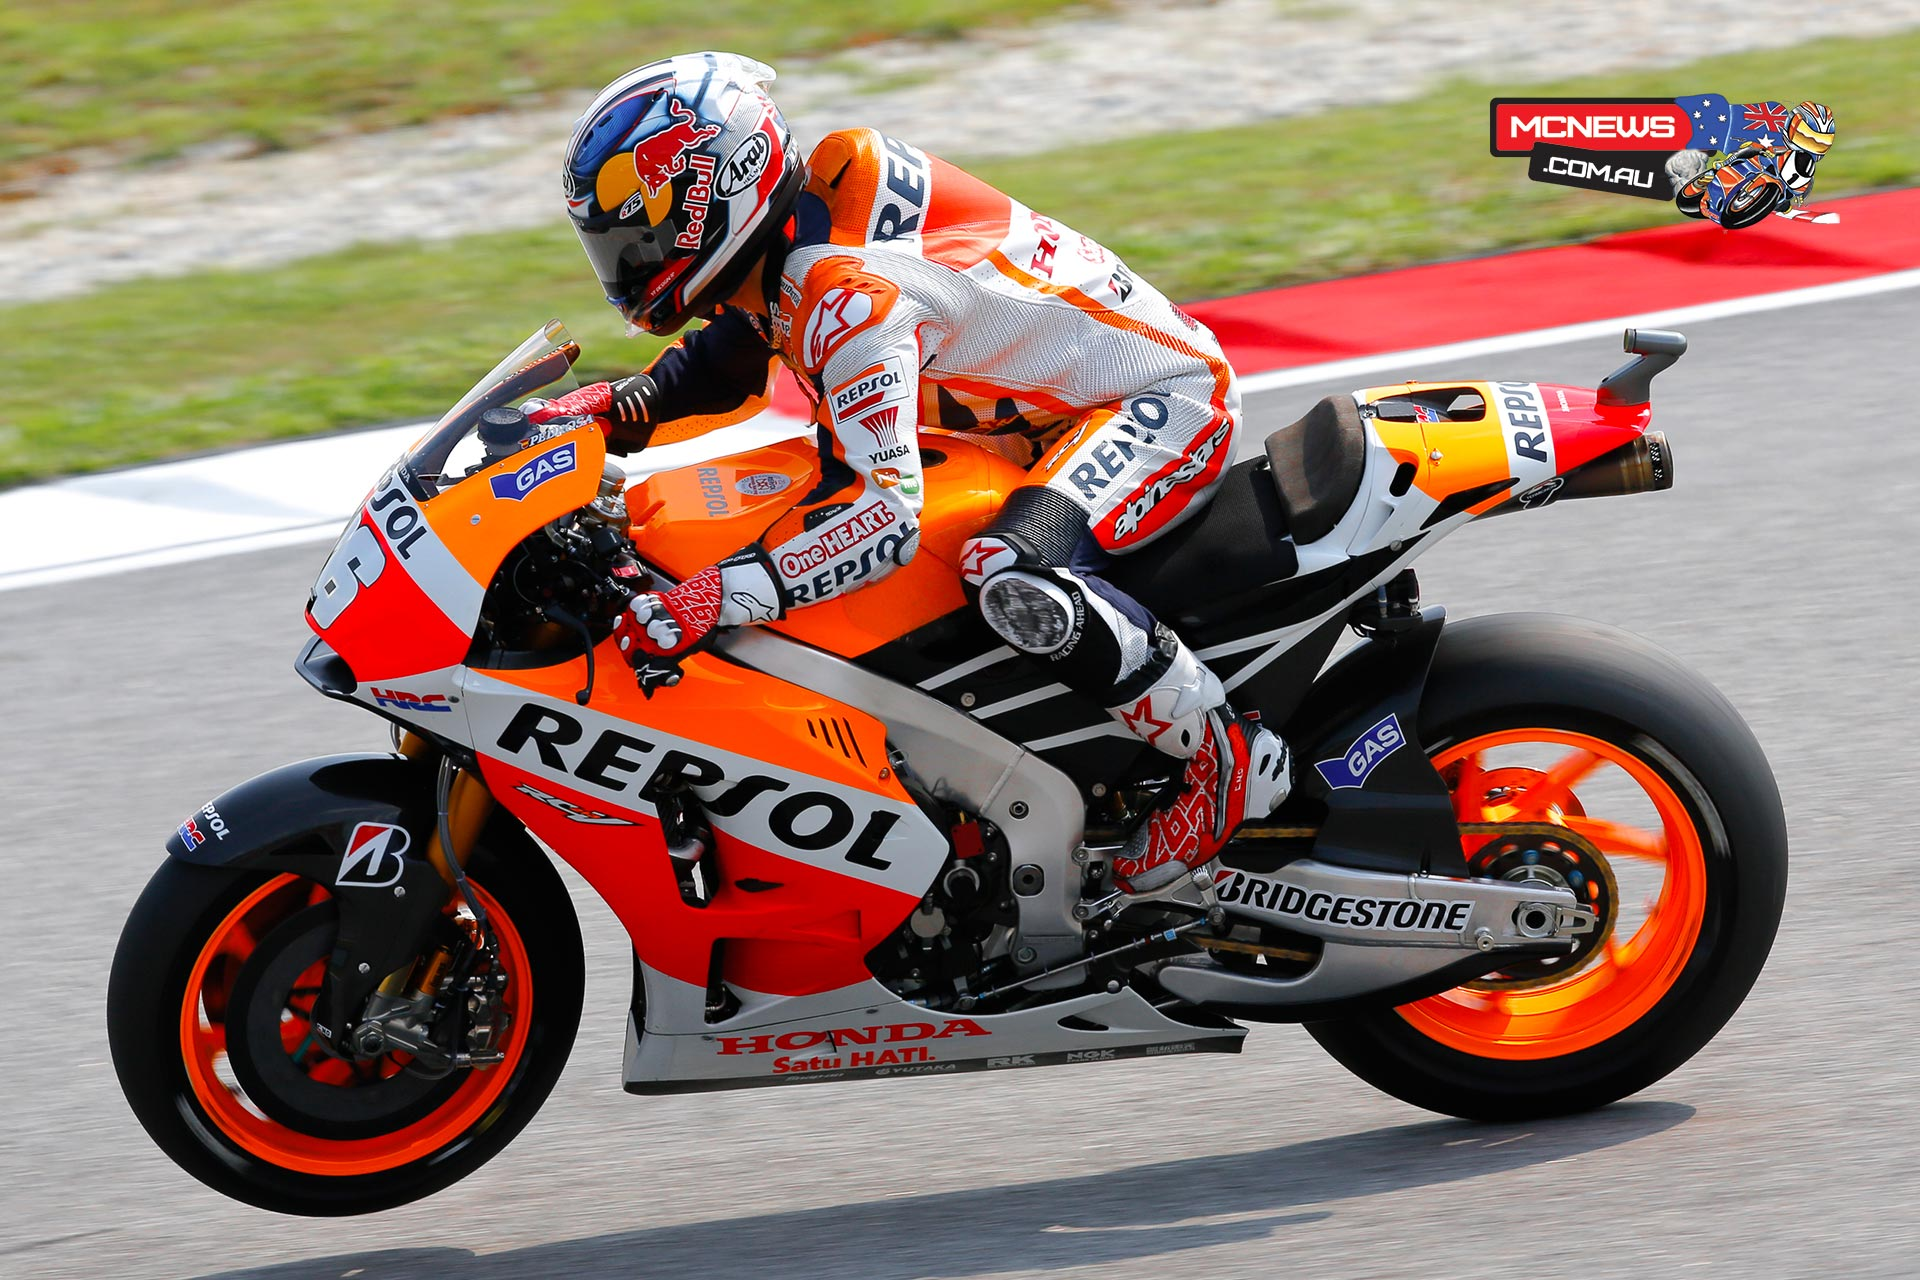 Dani Pedrosa MotoGP Sepang 2014 Qualifying Practice Classification MotoGP